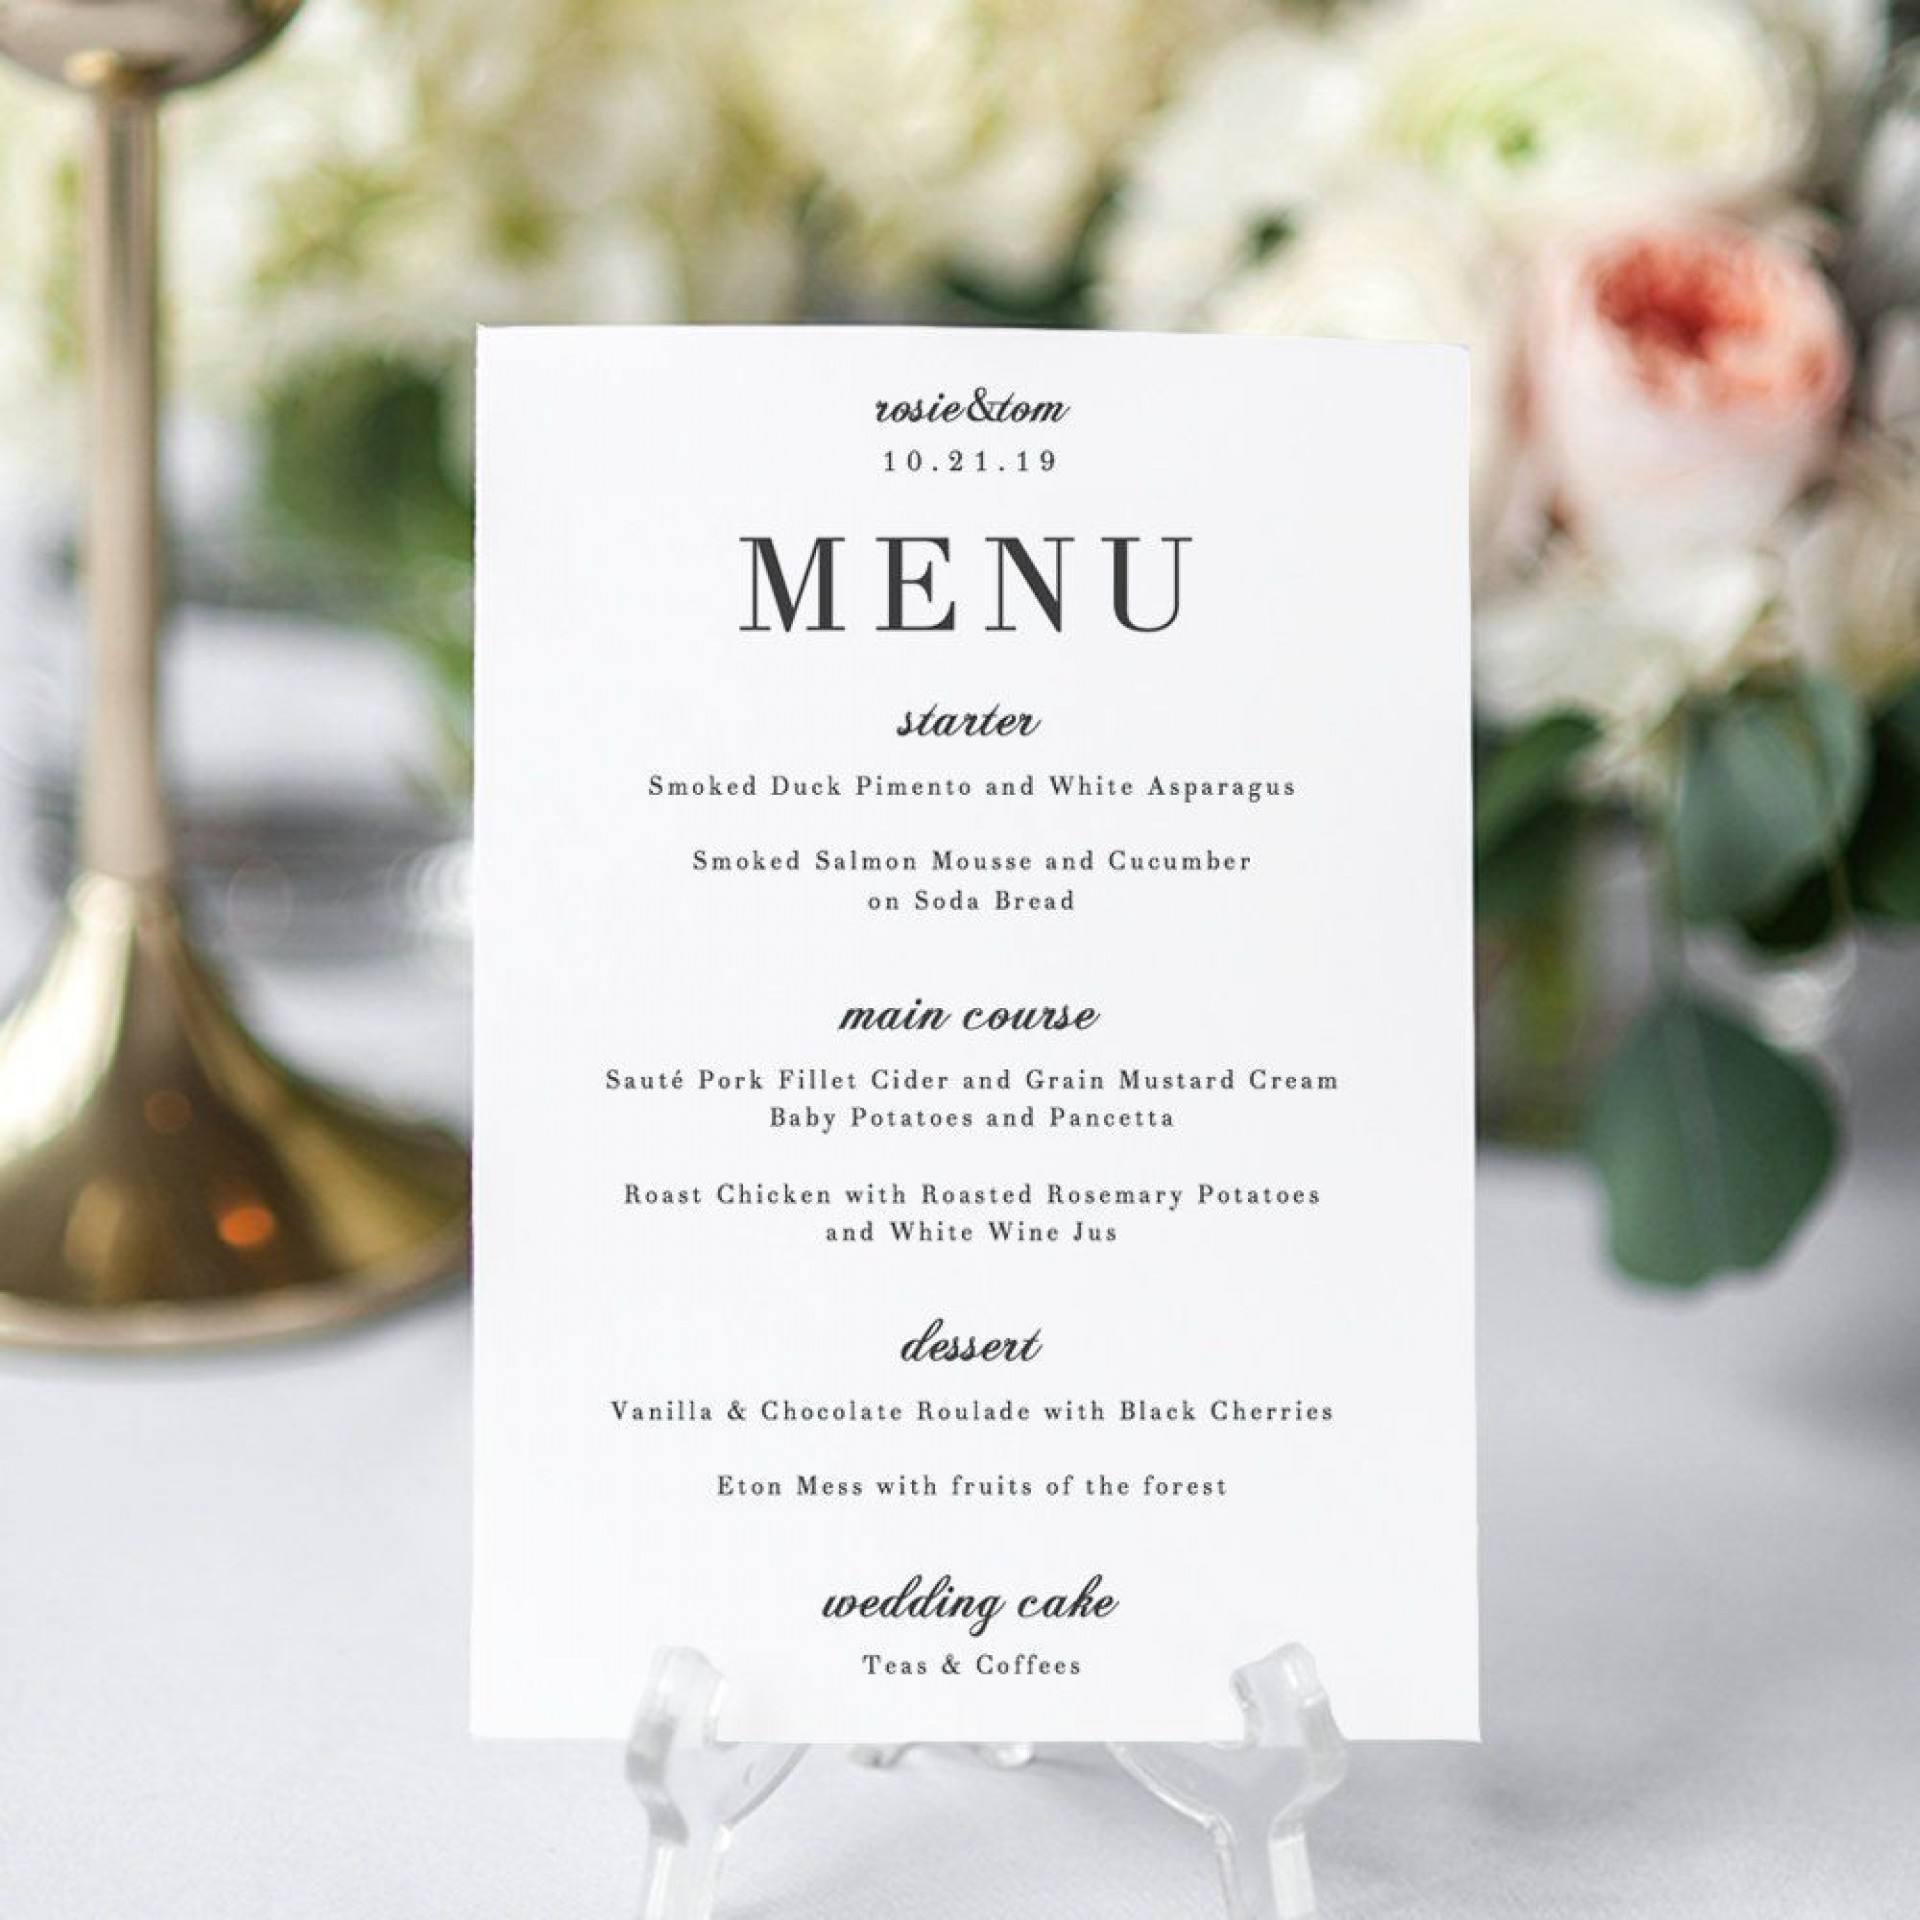 001 Amazing Elegant Wedding Menu Card Template Highest Clarity  Templates1920